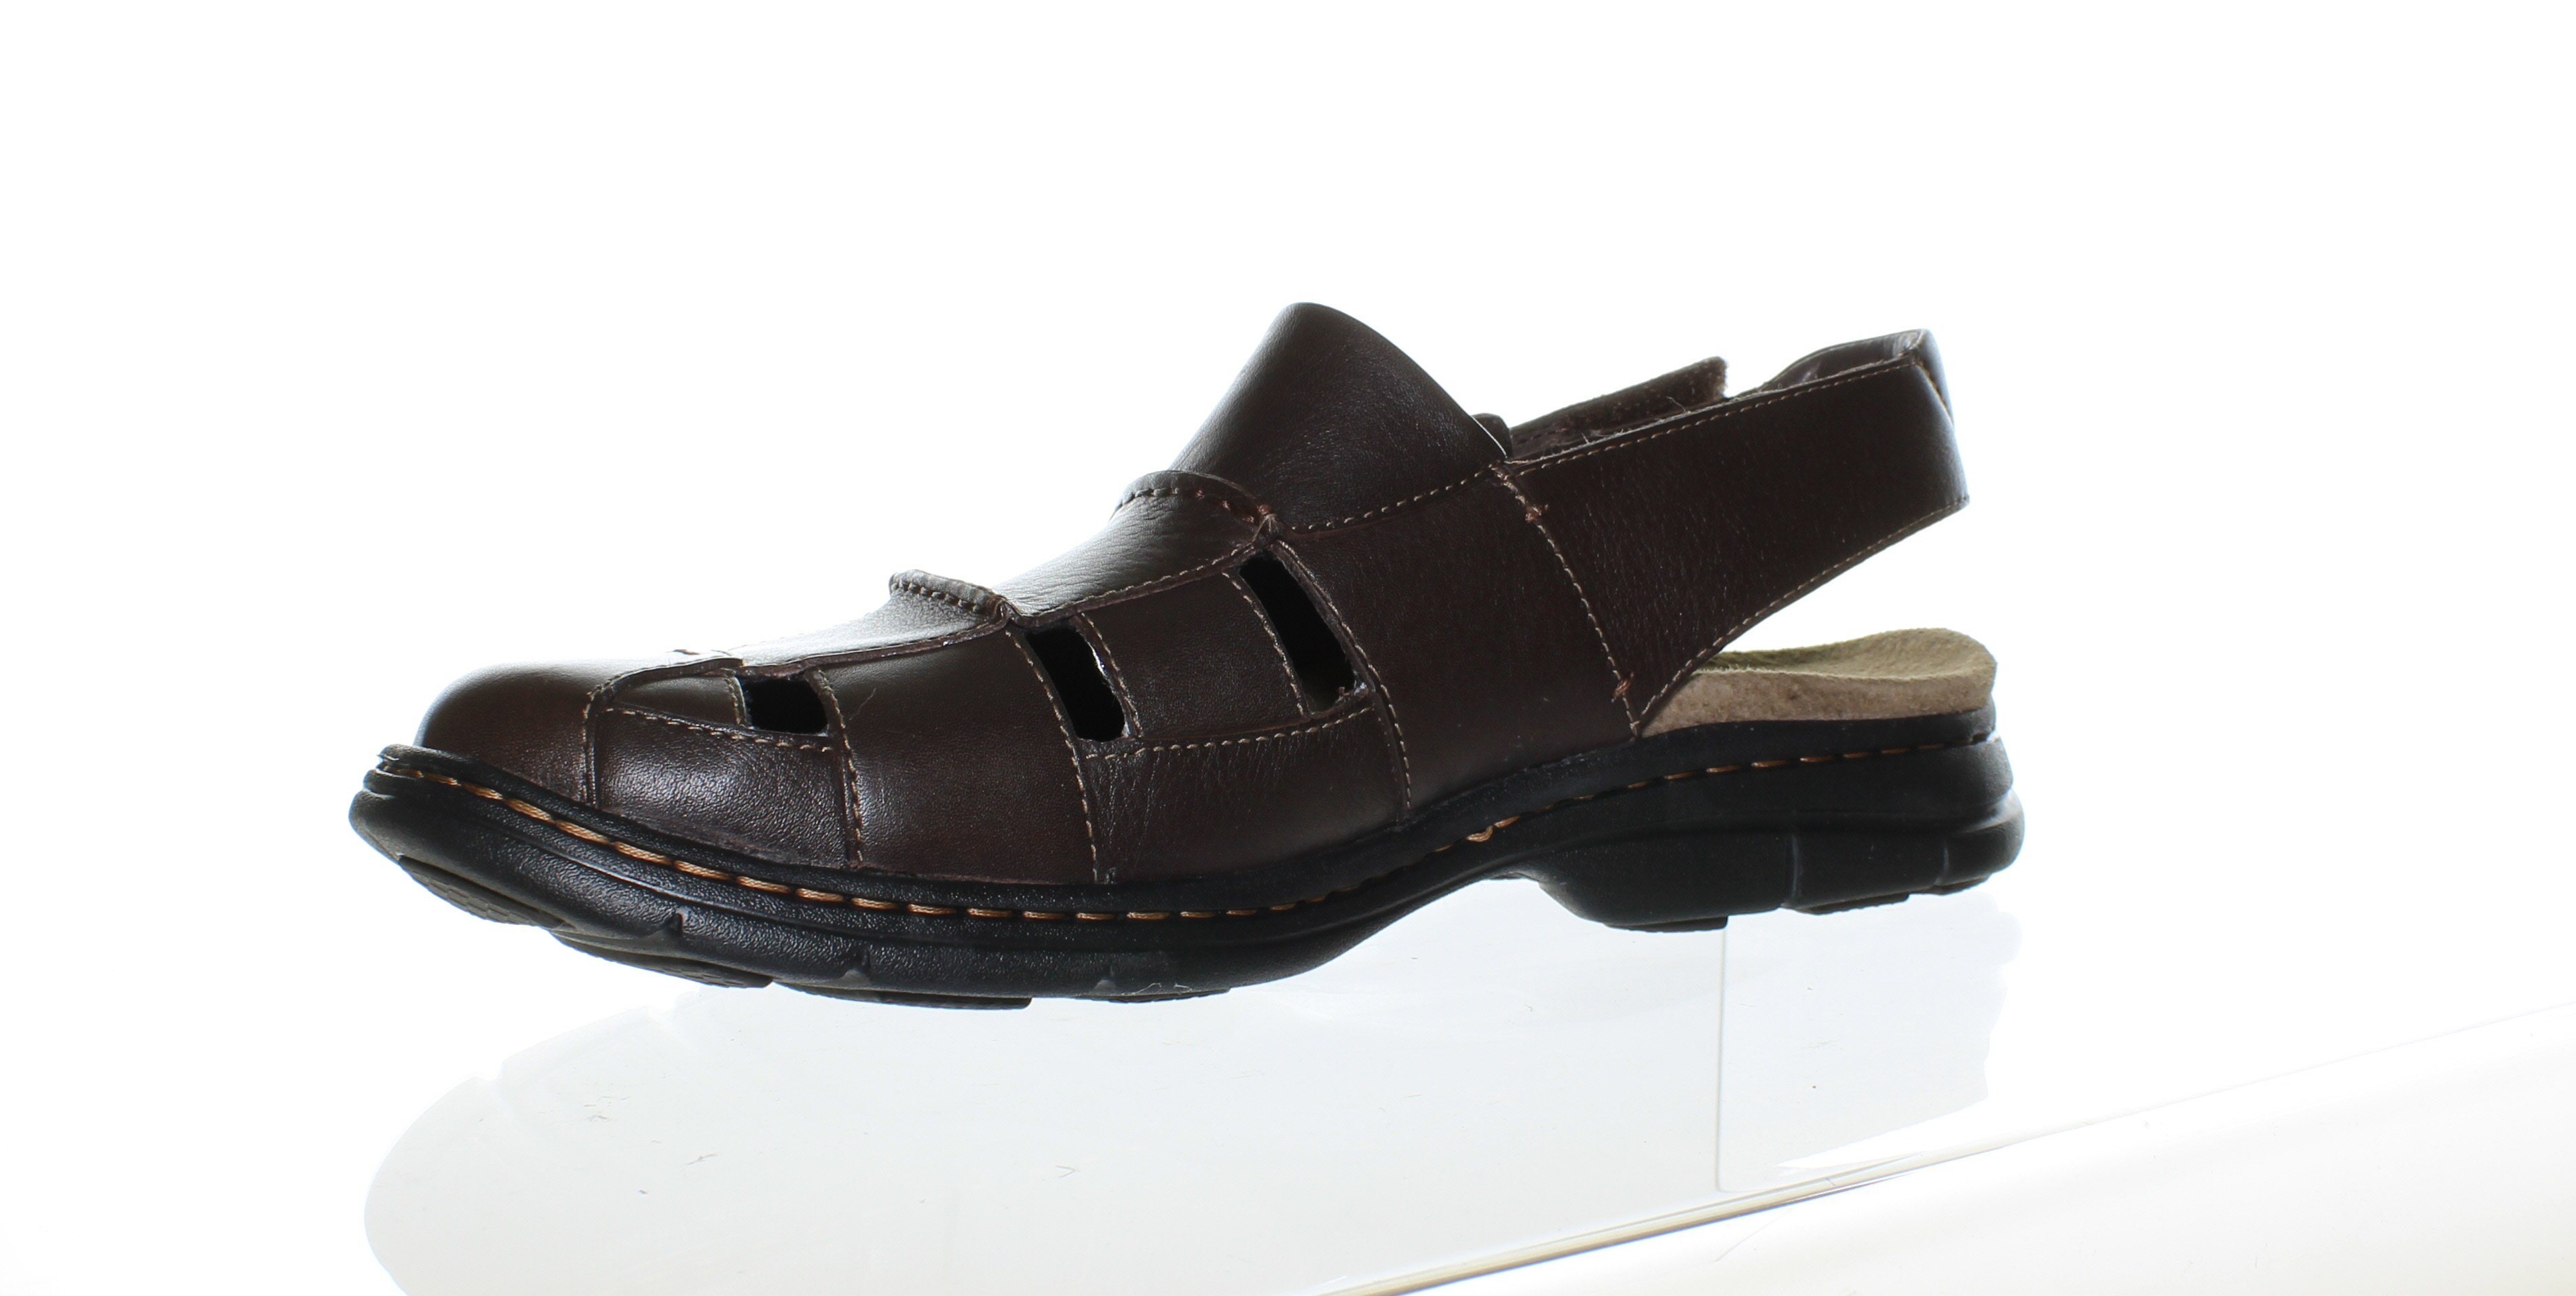 fc89db99604c Dunham - Dunham Mens Monterey Brown Fisherman Sandals Size 13 - Walmart.com